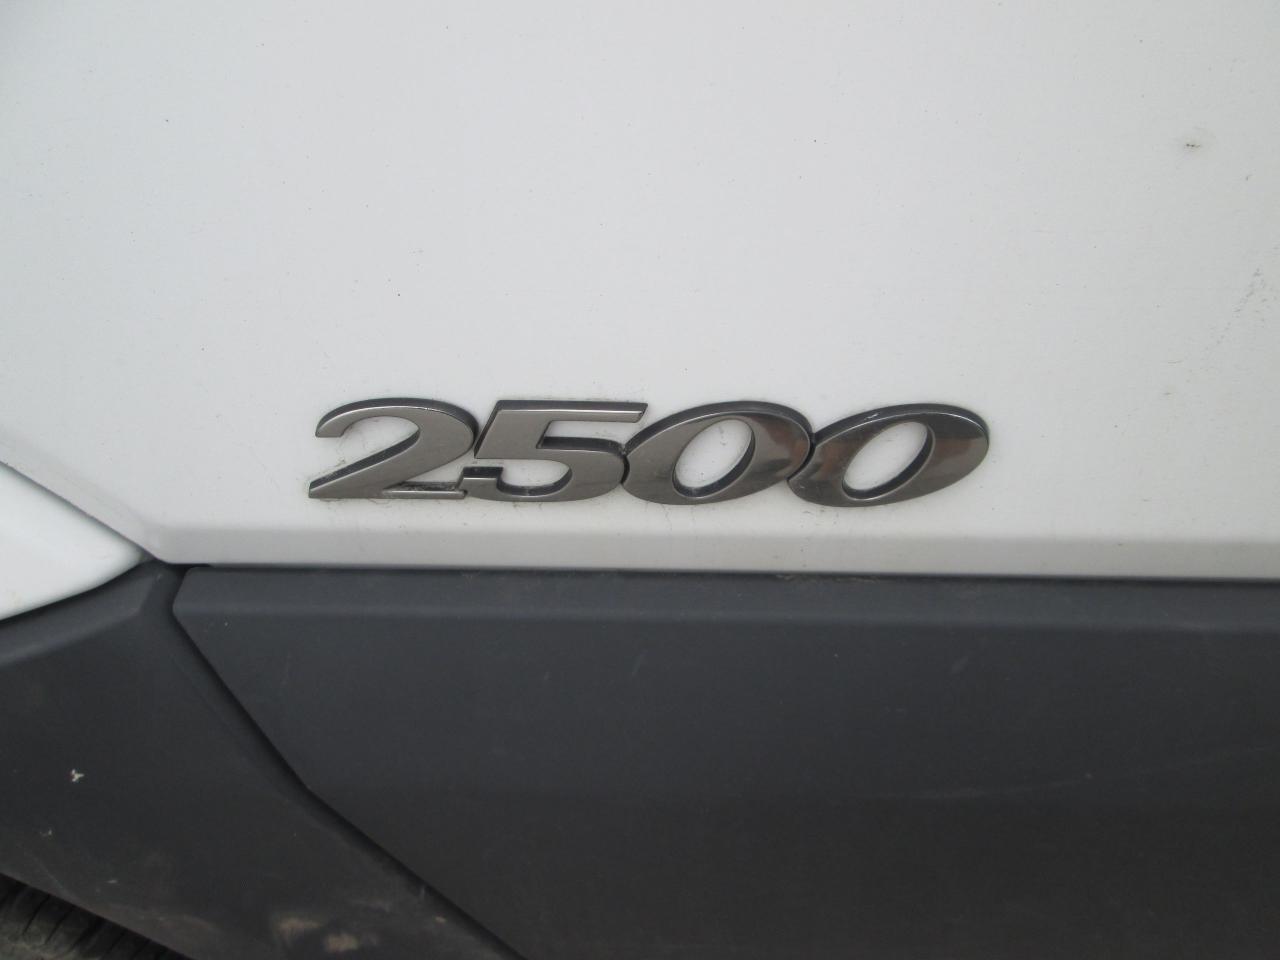 2011 Mercedes-Benz Sprinter